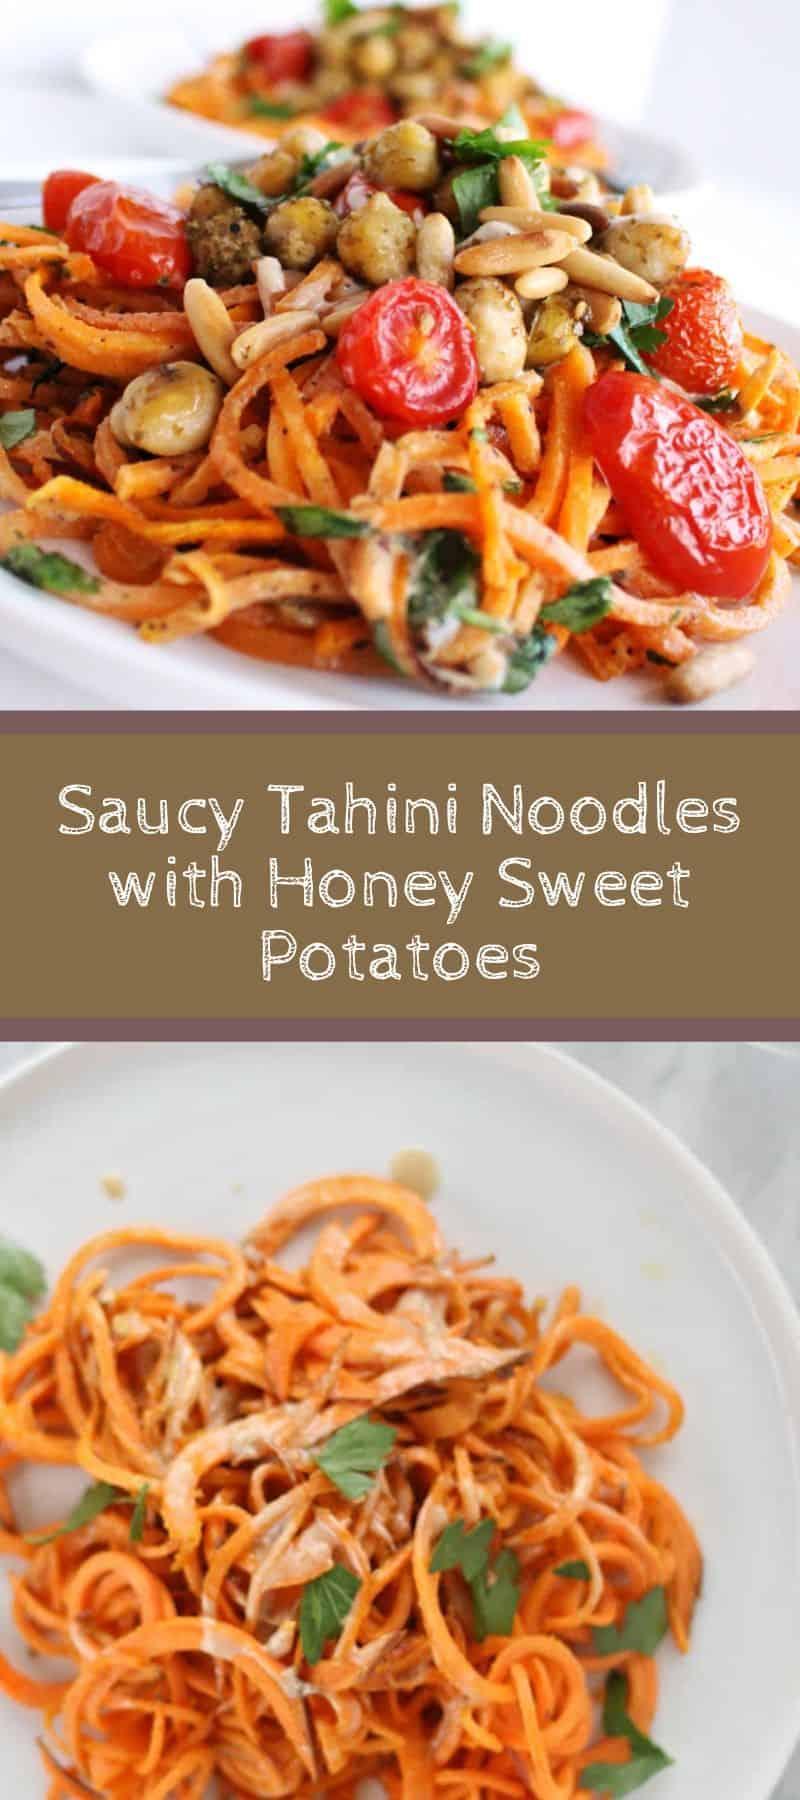 Saucy Tahini Noodles with Honey Sweet Potatoes 3